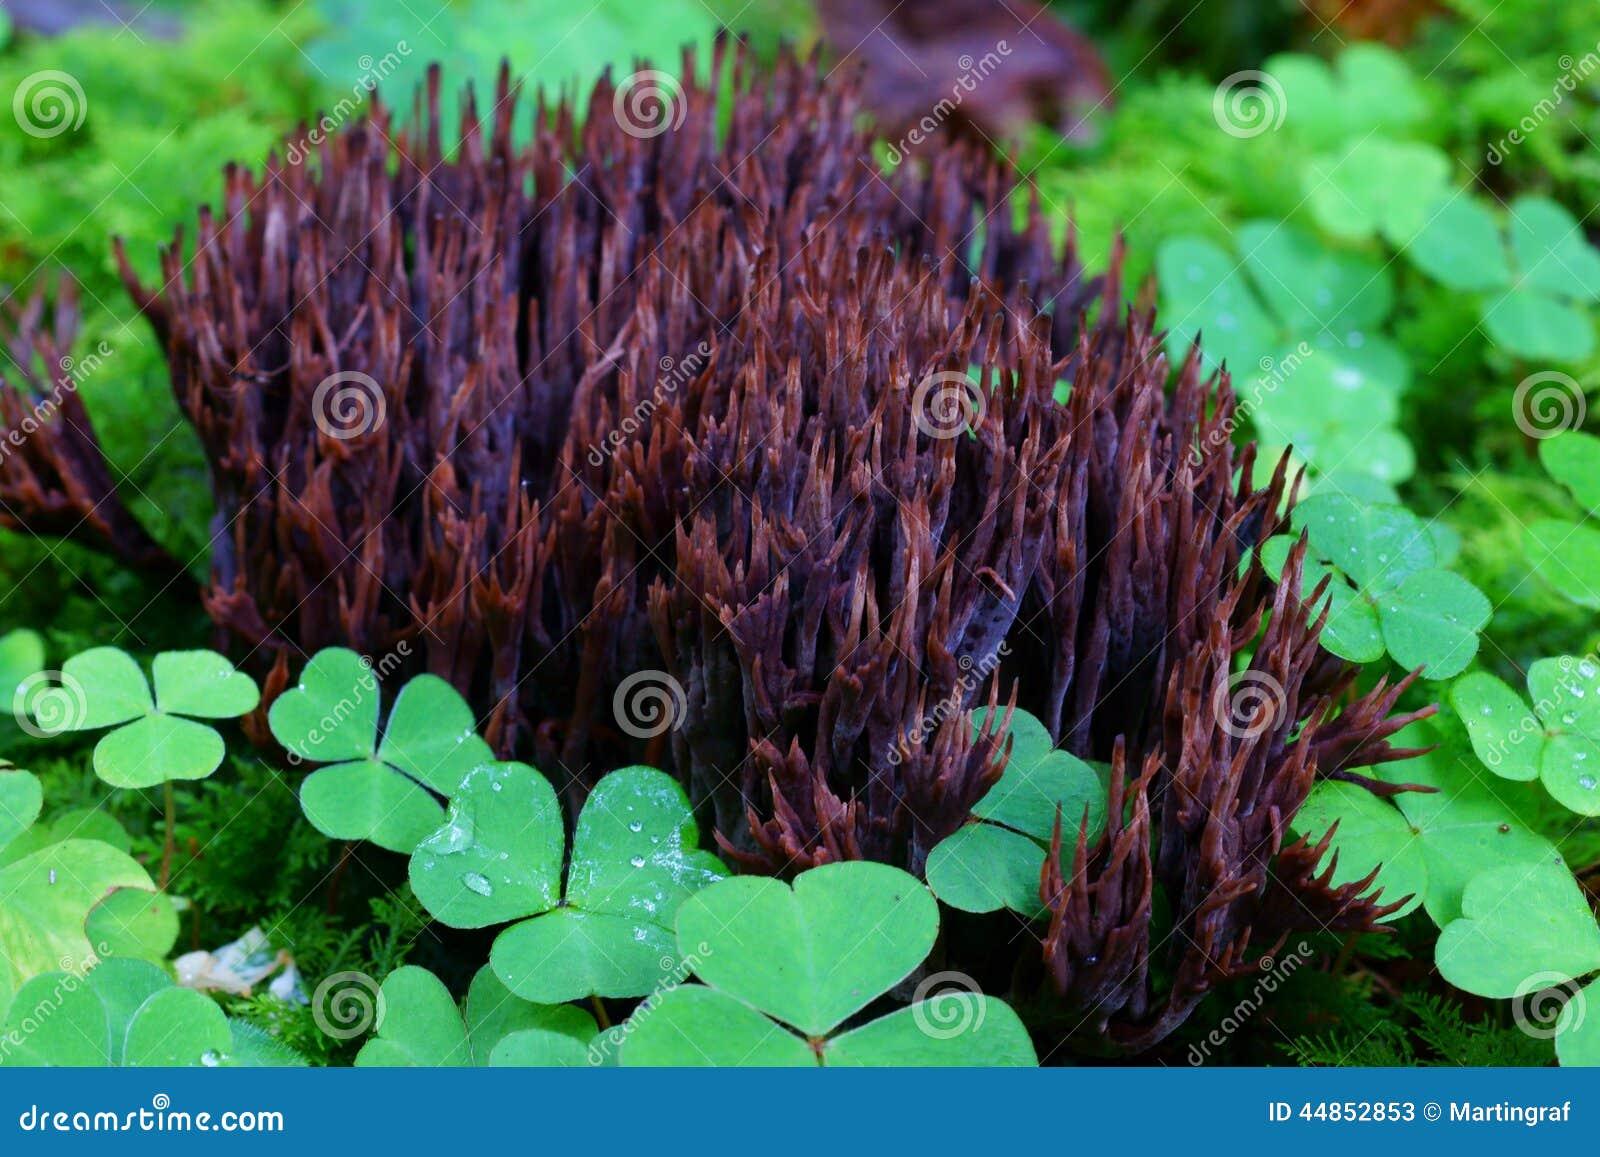 Brotes fungosos púrpuras